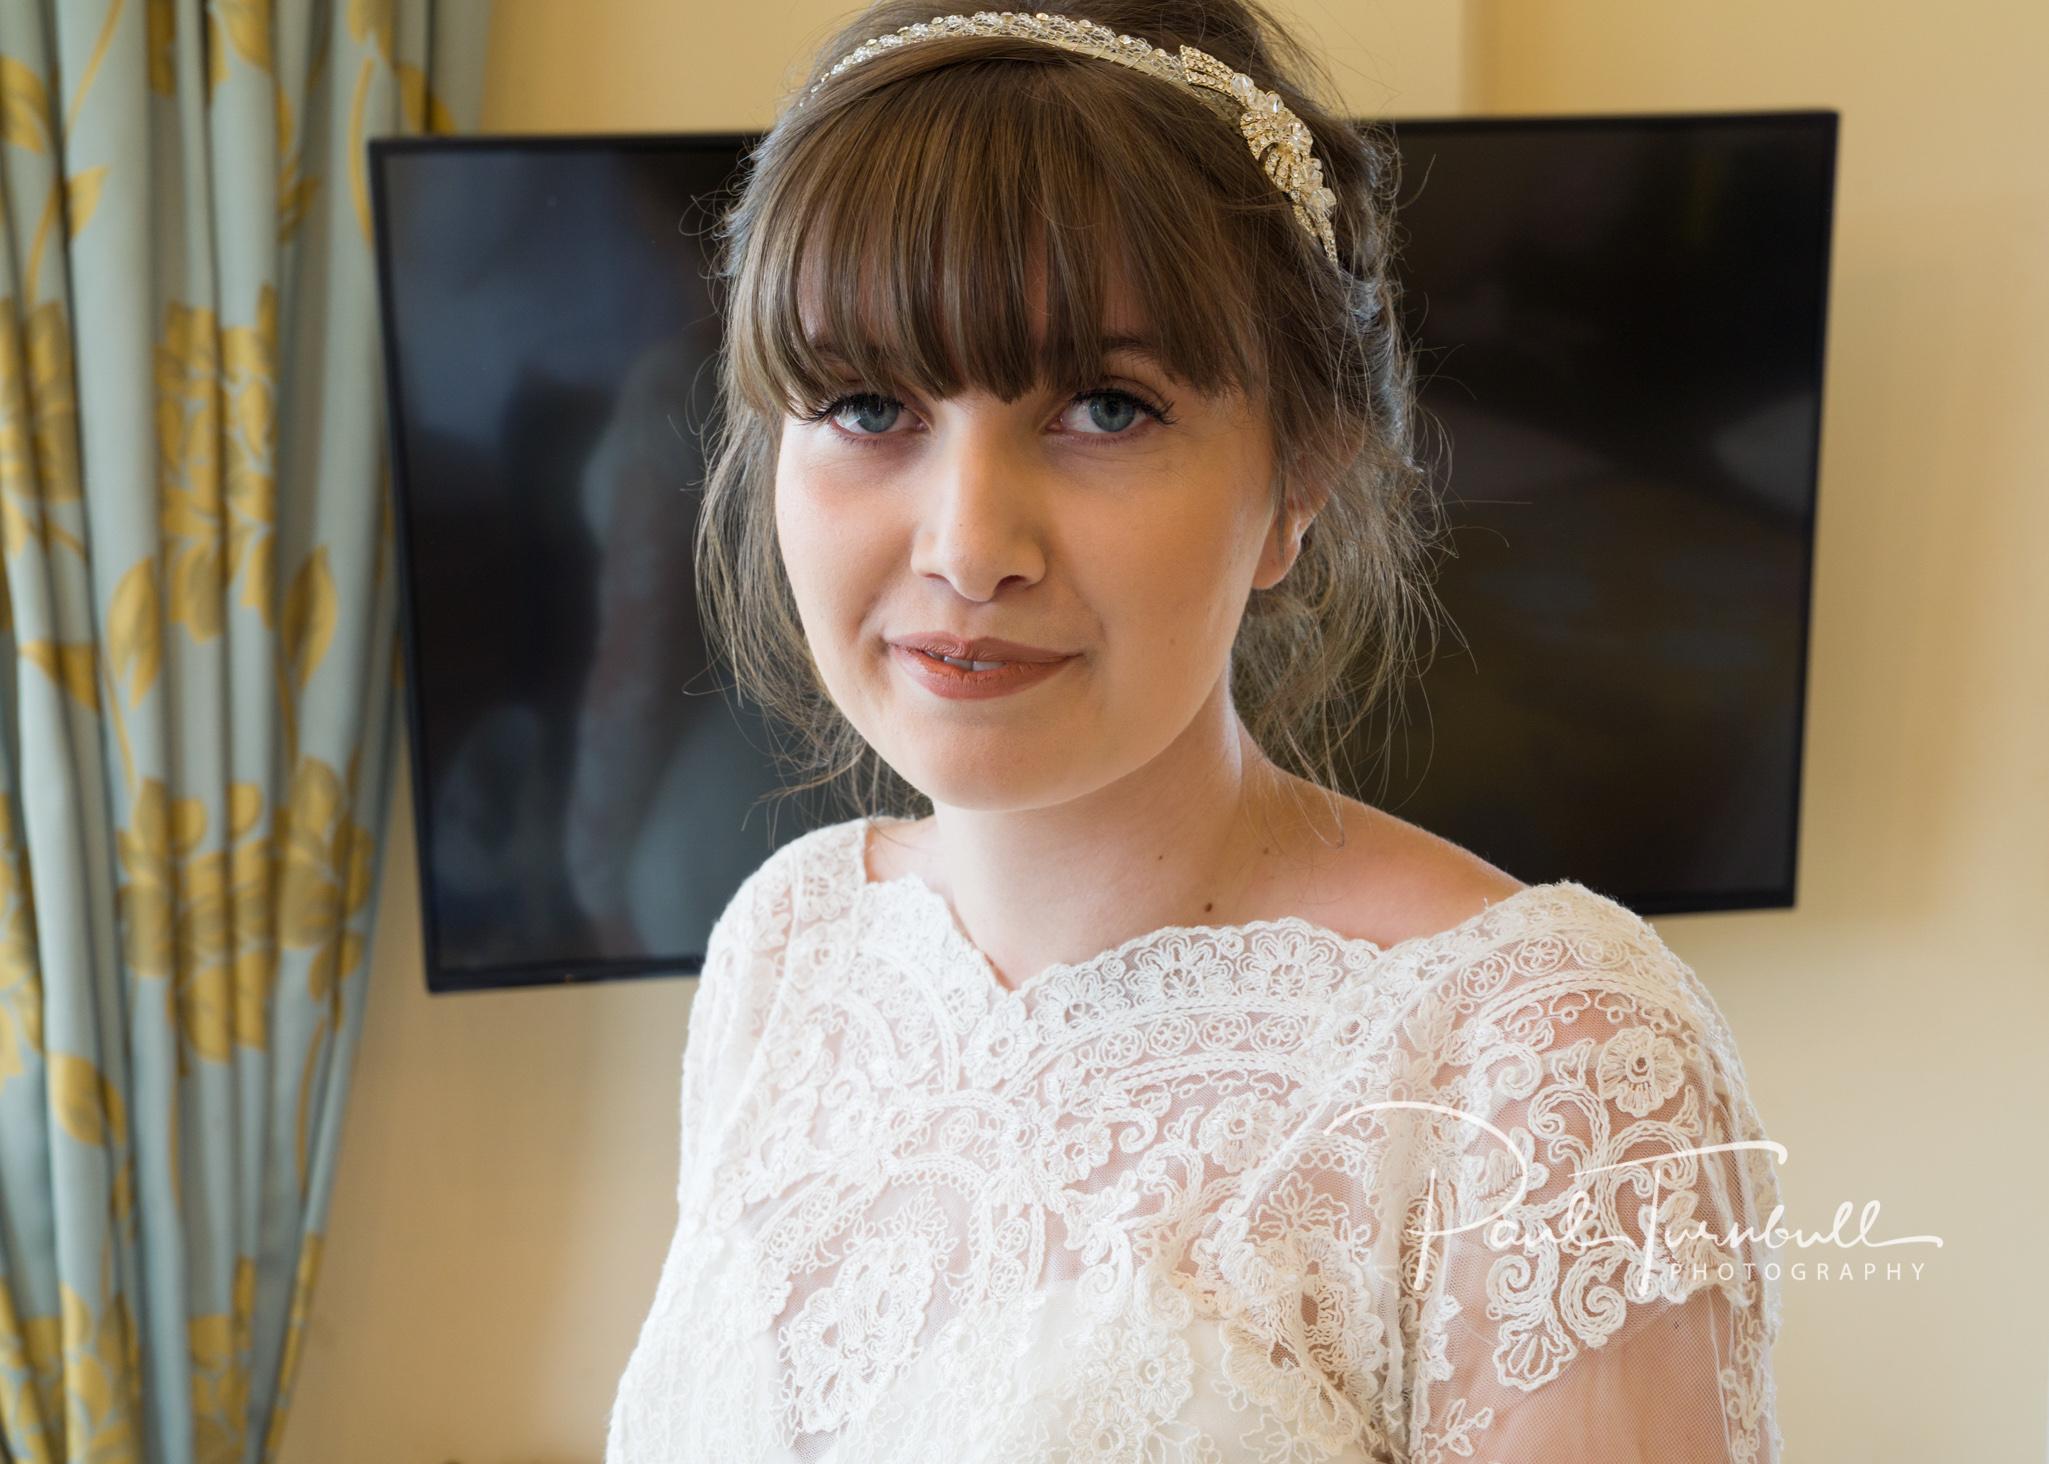 wedding-photographer-raven-hall-ravenscroft--scarborough-yorkshire-lucy-ryan-017.jpg